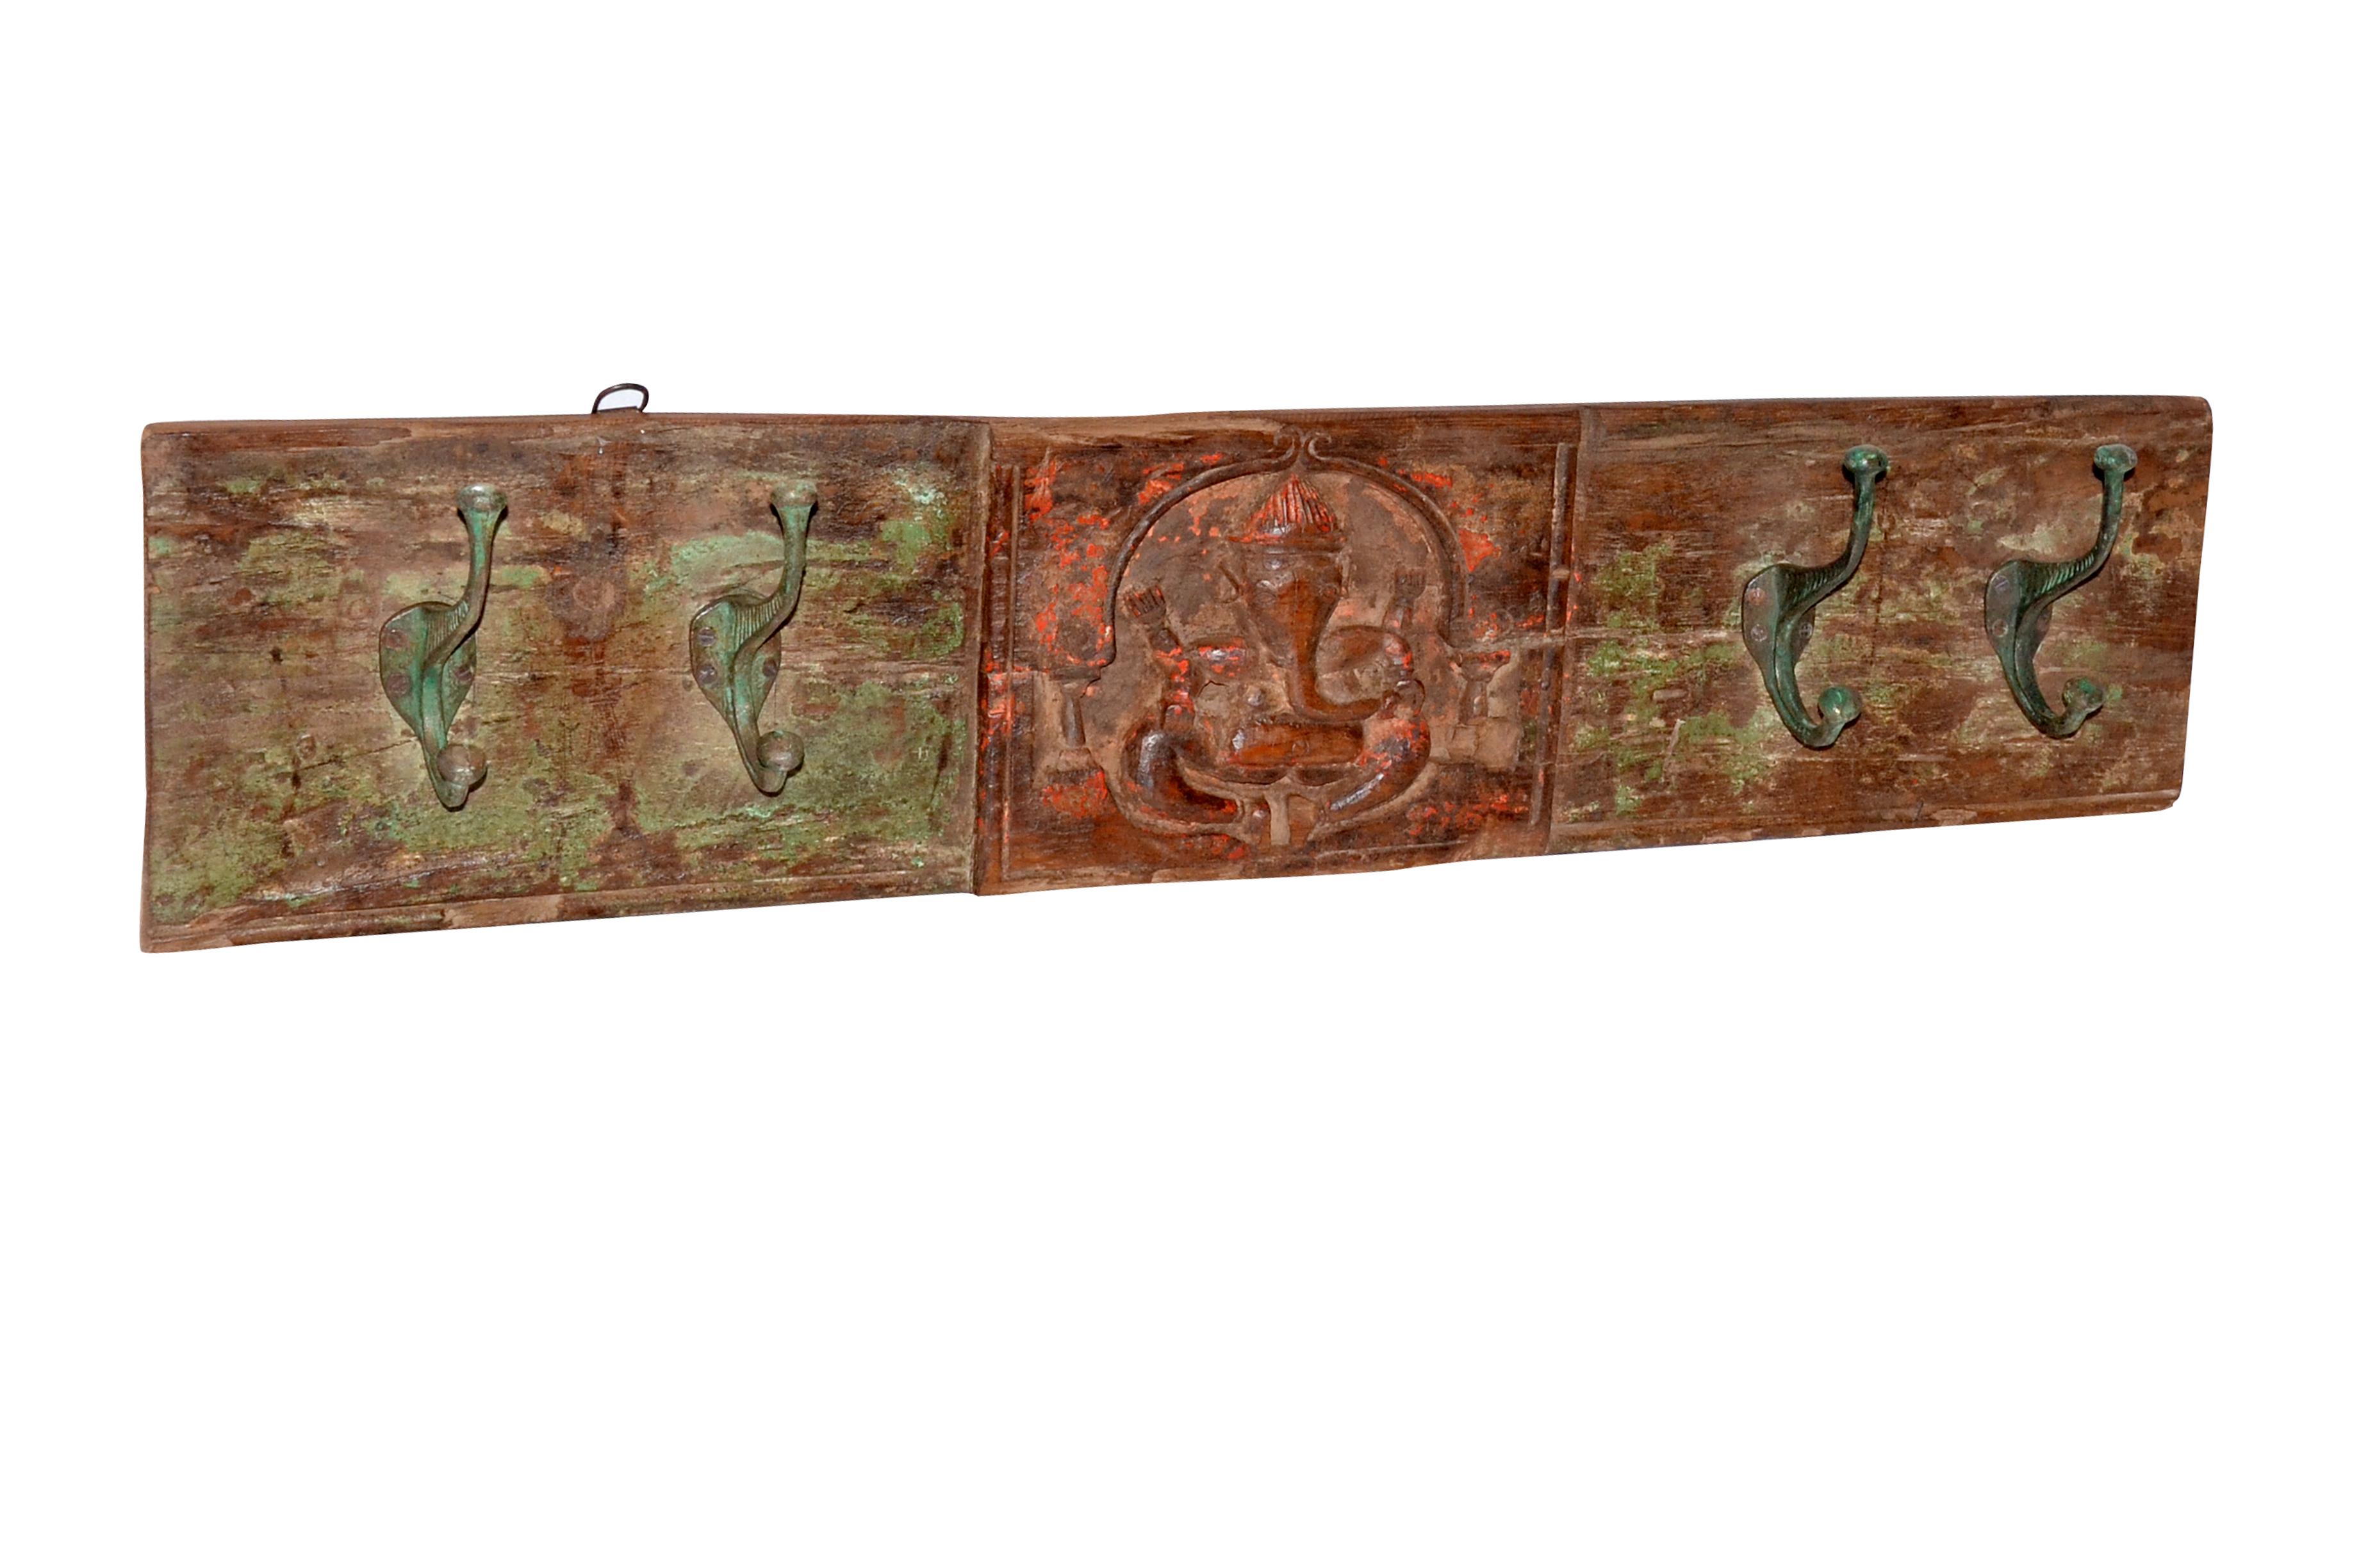 ANRA1164 - 84 x 2 x 20cm